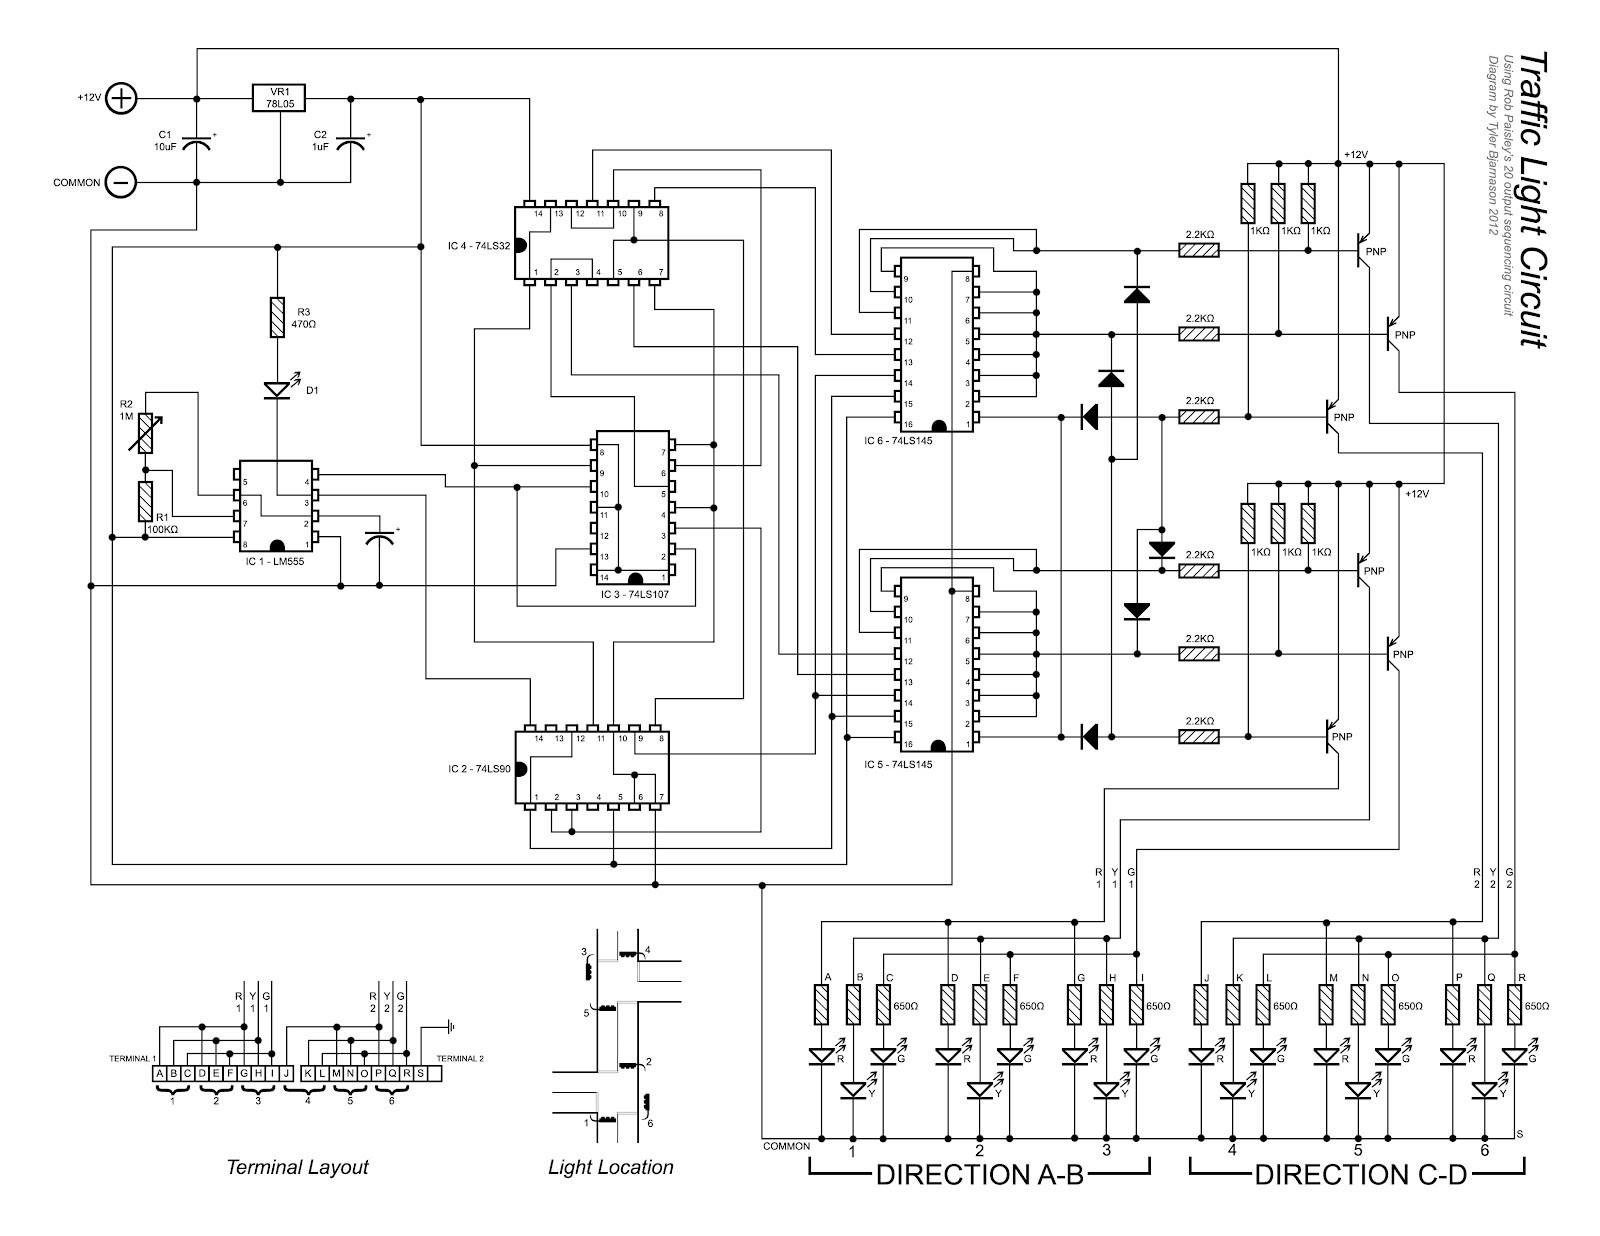 Electrical Light Wiring Diagramc Australia Street Fitting Uk Australian Diagram Electric Switch 1680